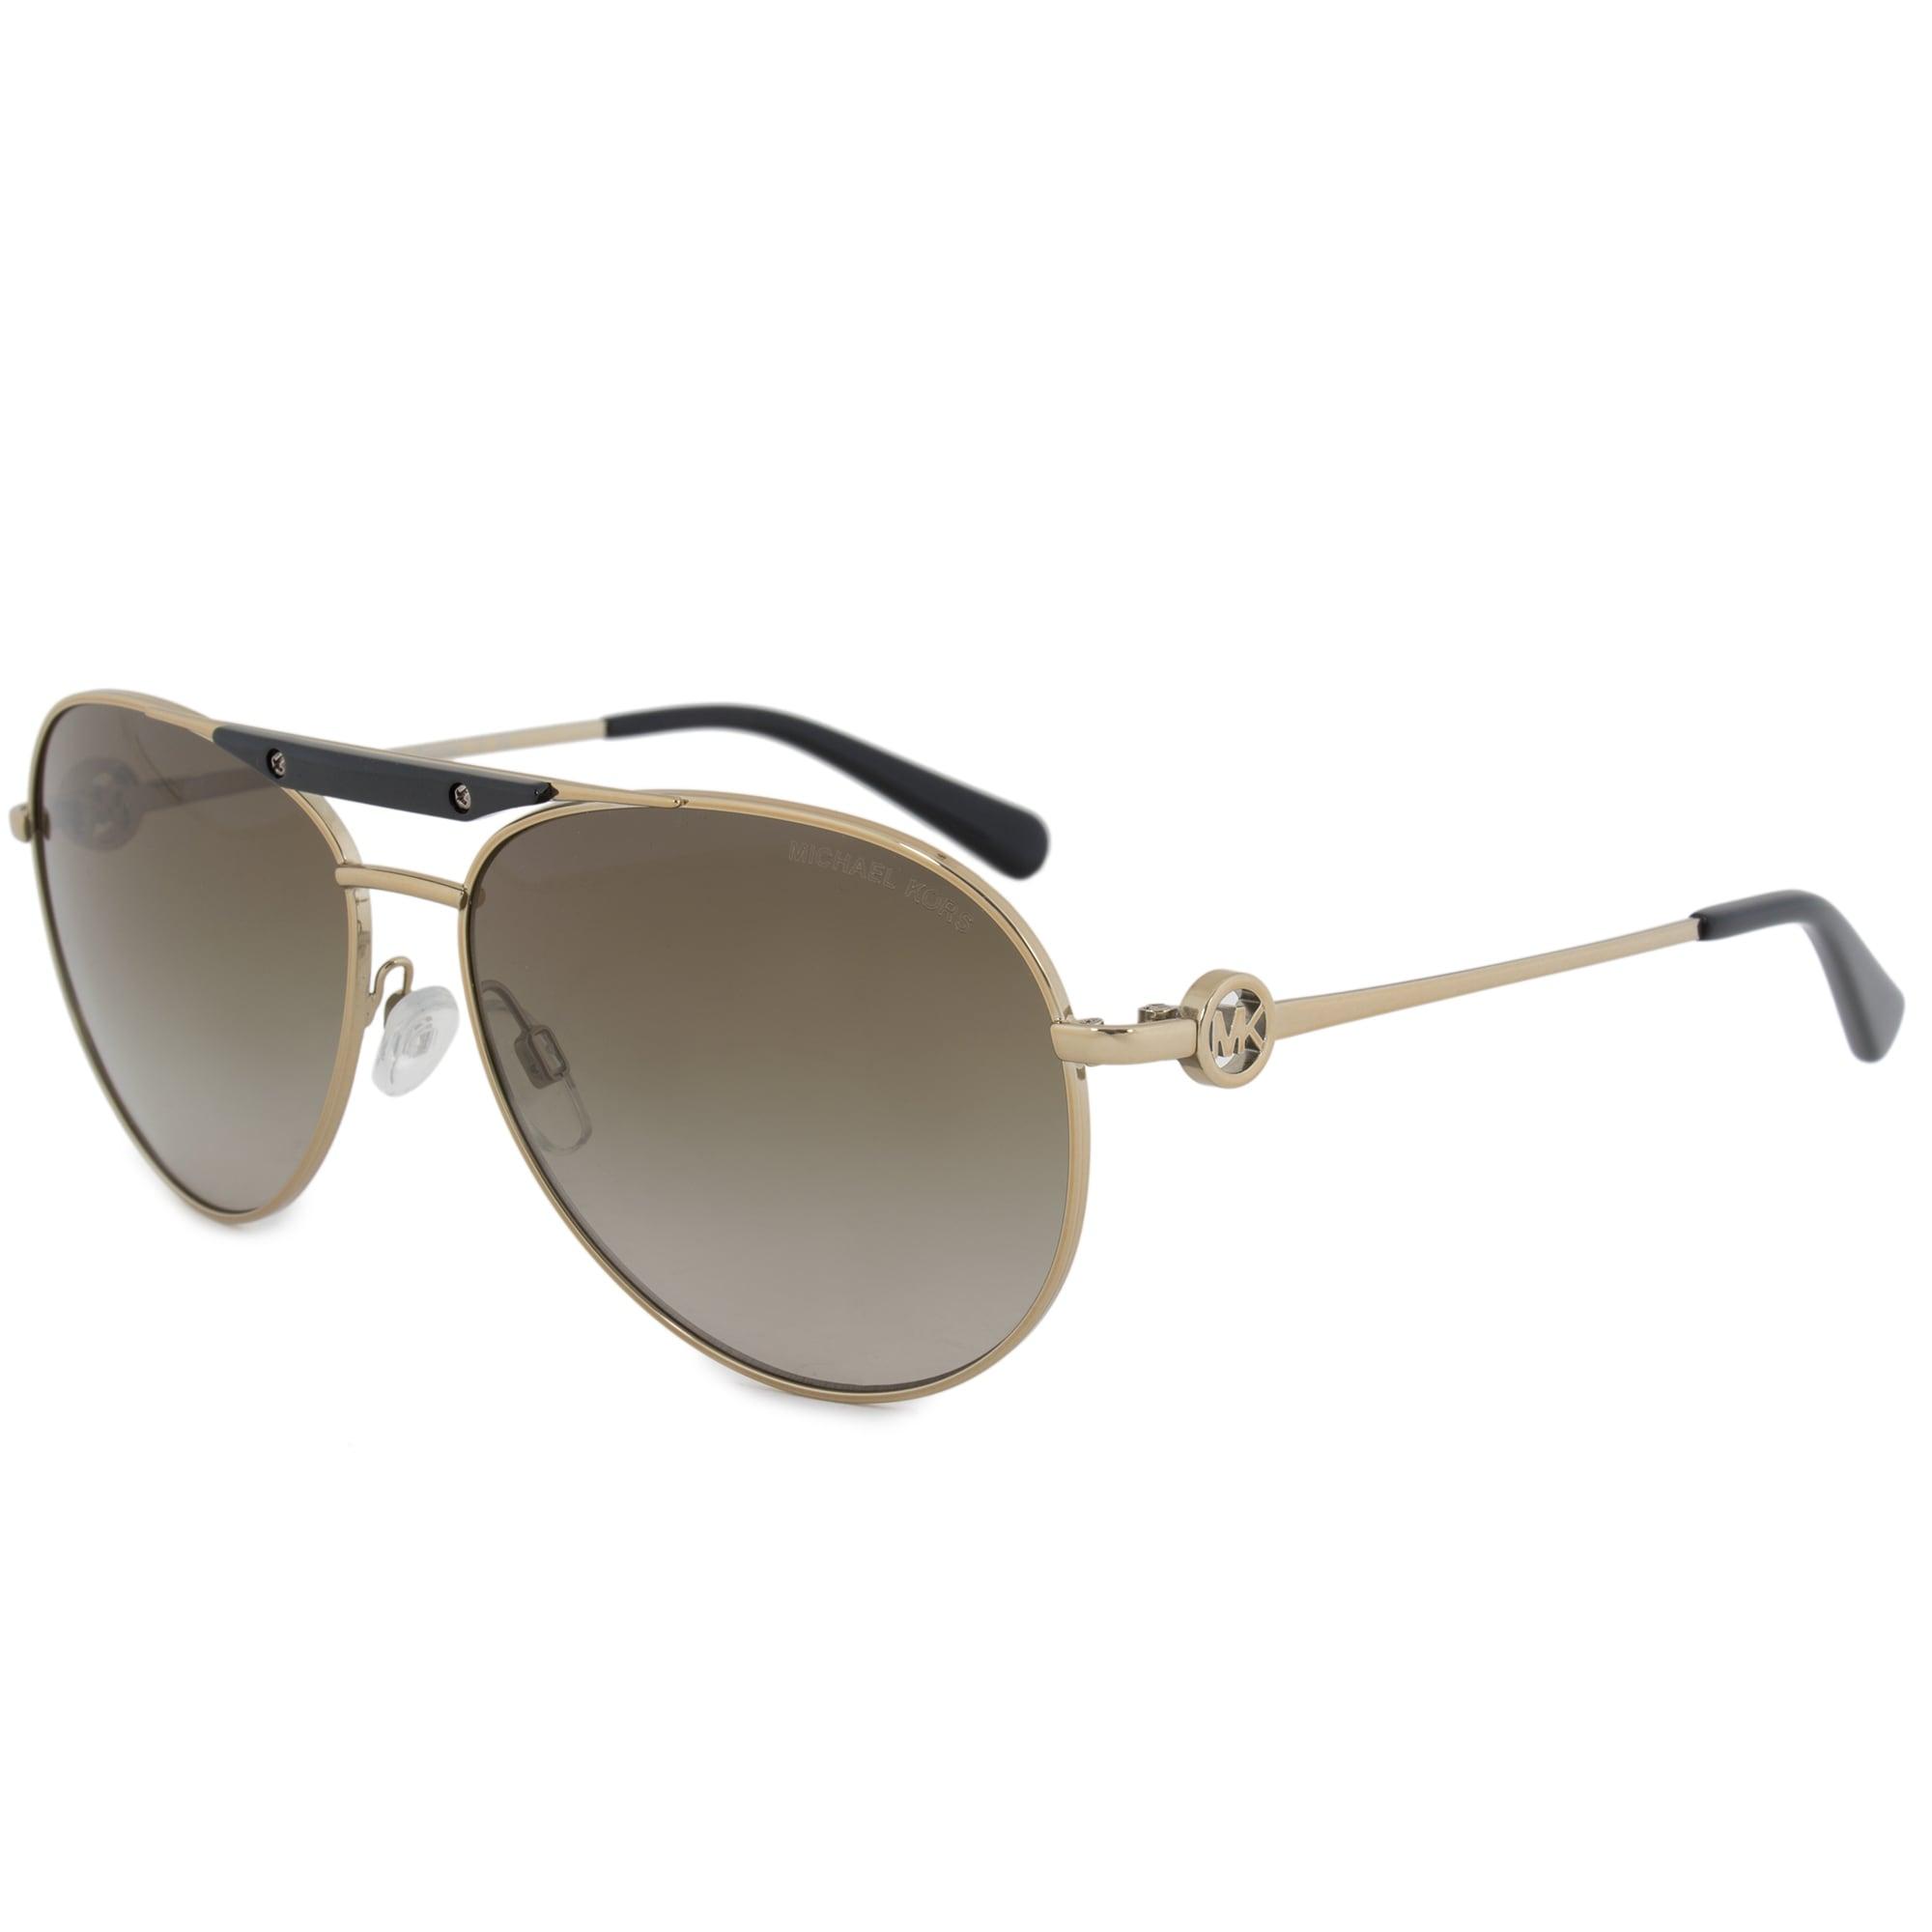 f446aab39b Shop Michael Kors Zanzibar Aviator Sunglasses MK5001 100413 58 - On Sale -  Free Shipping Today - Overstock.com - 19622504